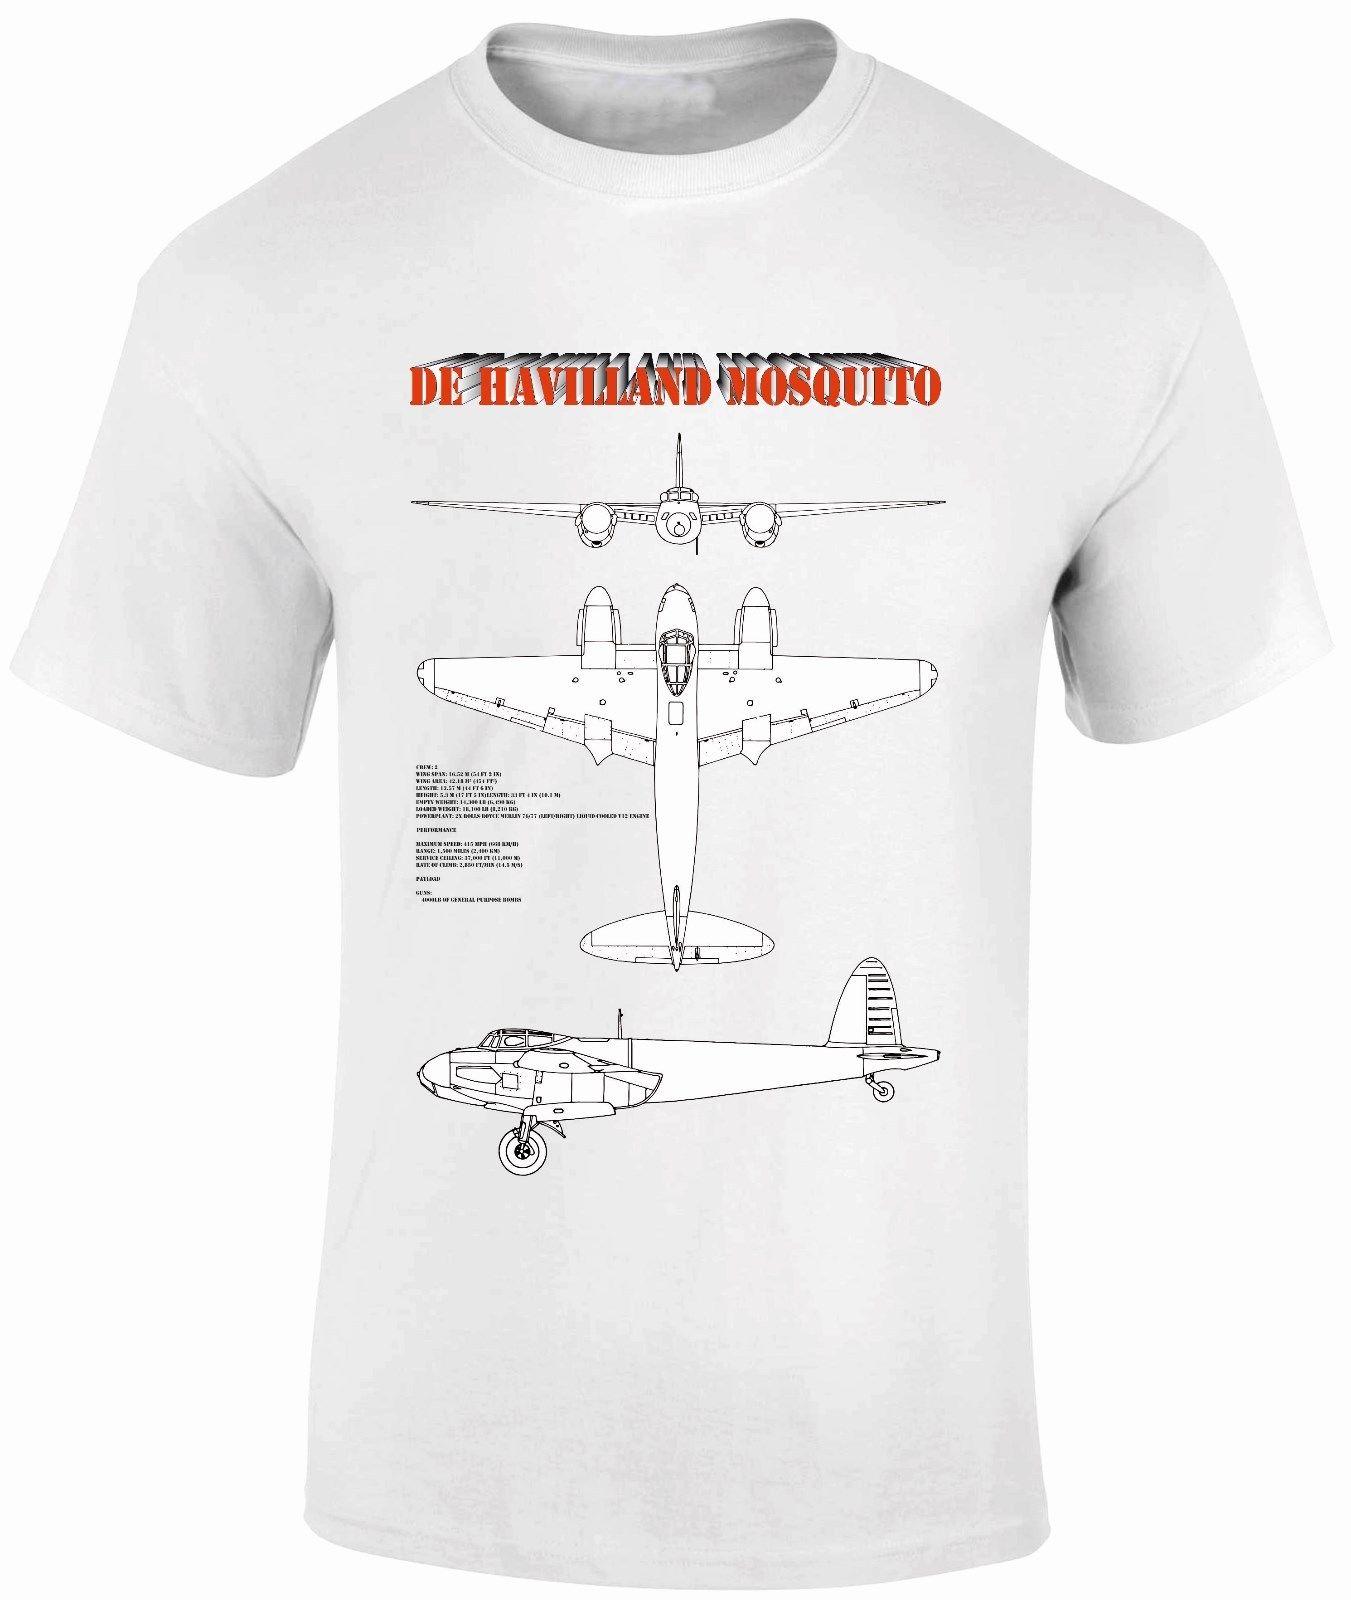 cc274737 Men Designer Clothes O-Neck Style Hip-Hop Tops T-Shirts FPBP303 De  Havilland Mosquito Blue Prints Combat Aircraft WW11 Planes